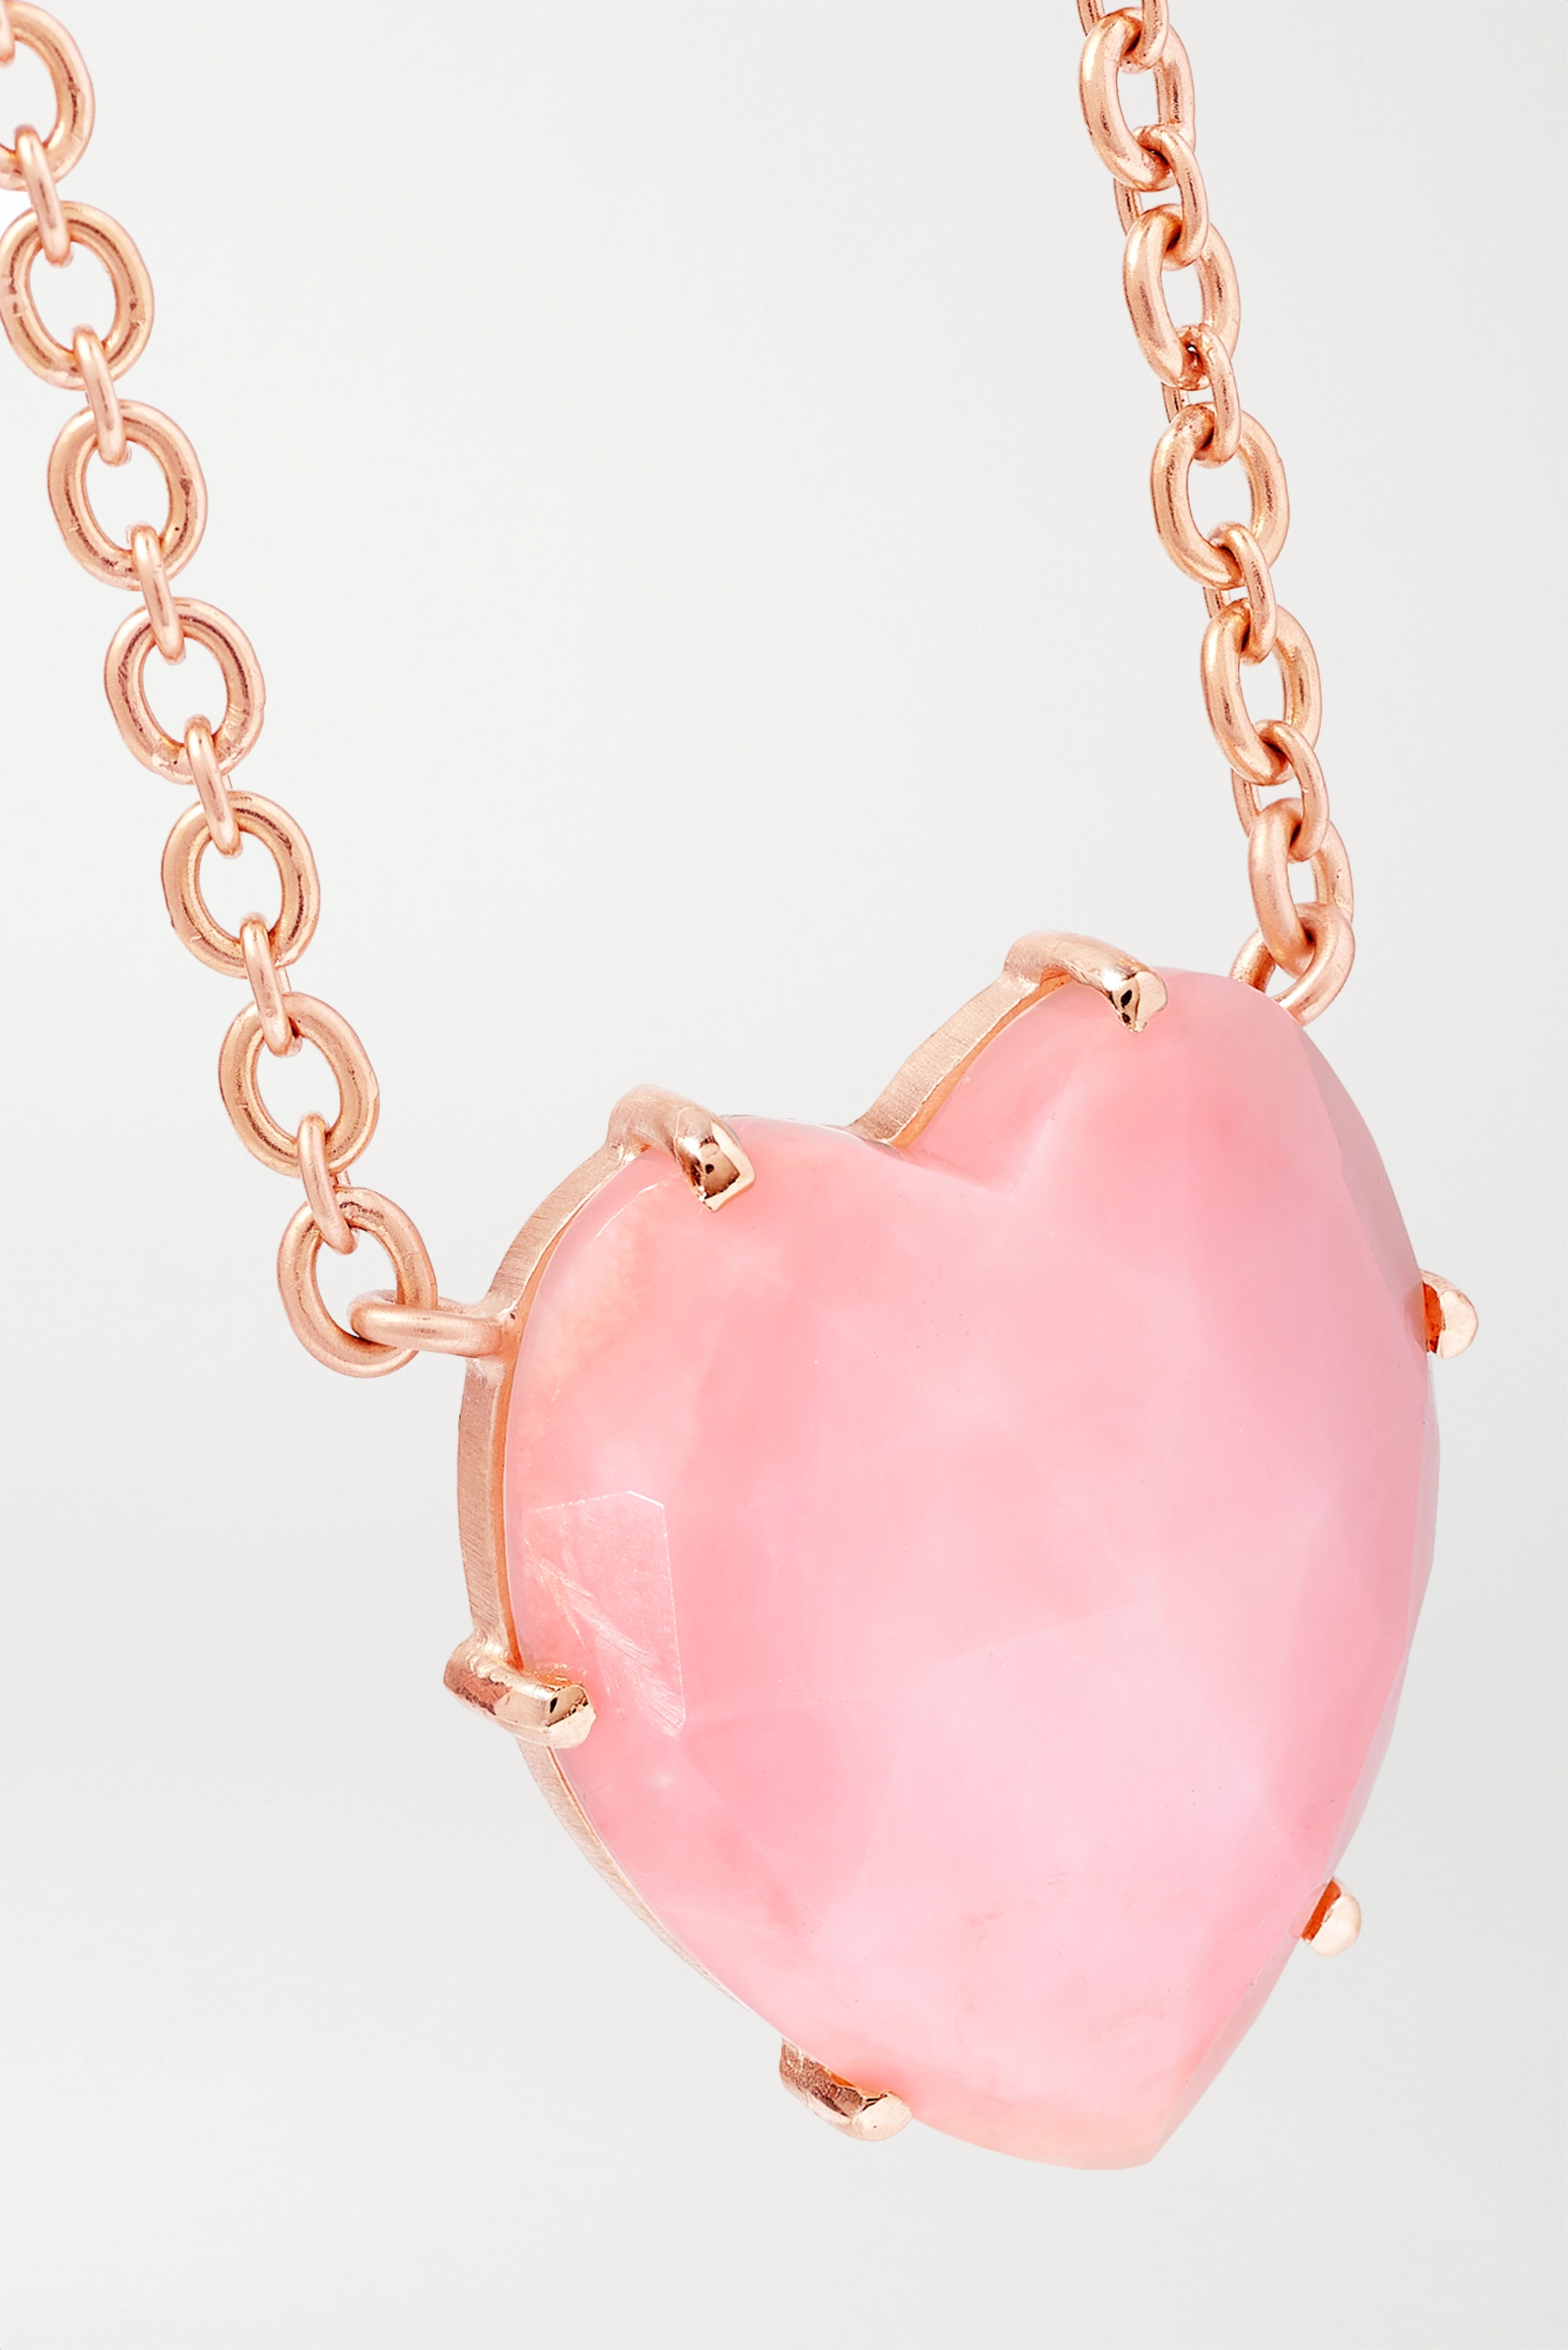 Irene Neuwirth Love 18-karat rose gold opal necklace